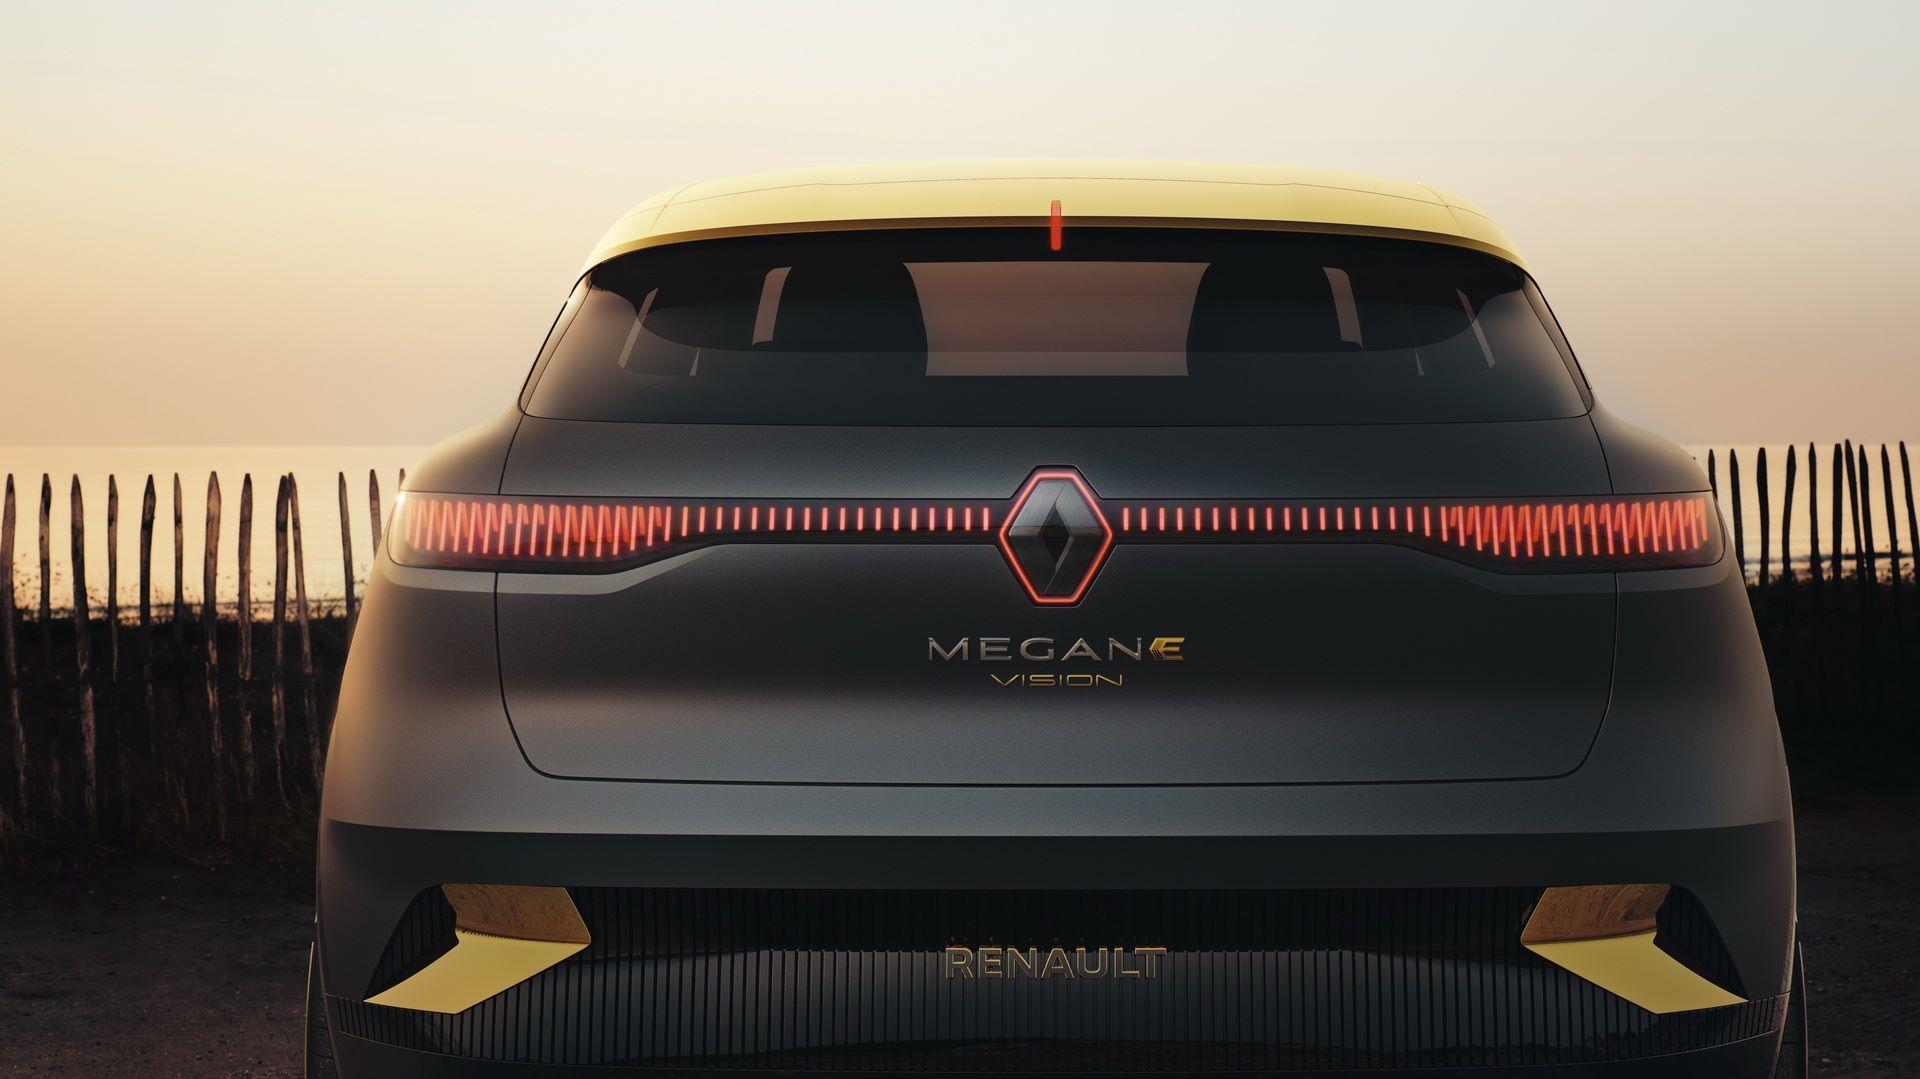 Renault-Megane-eVision-Concept-12